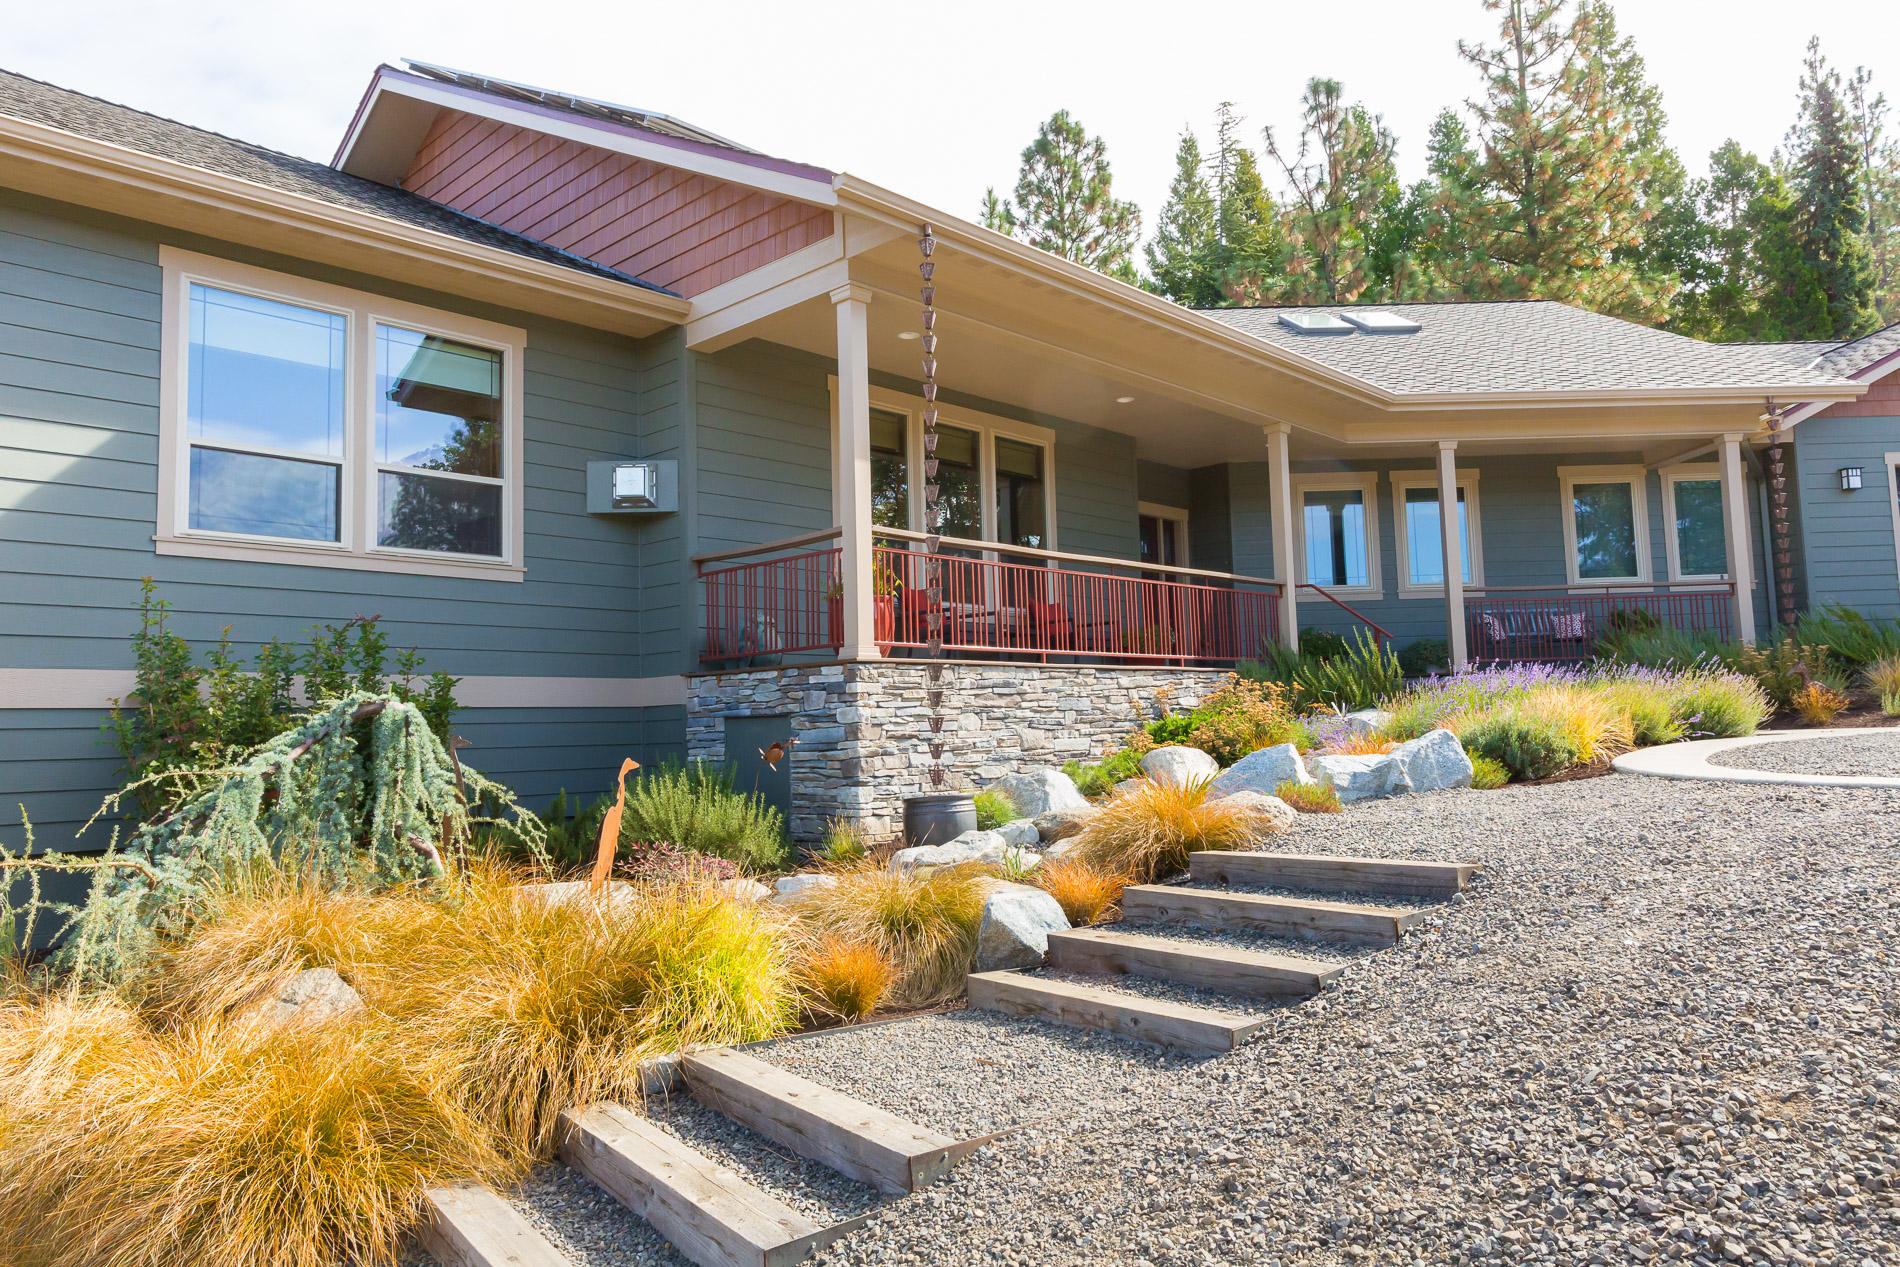 Hillside Perennial Plantings + Timber + Gravel Access Staircase